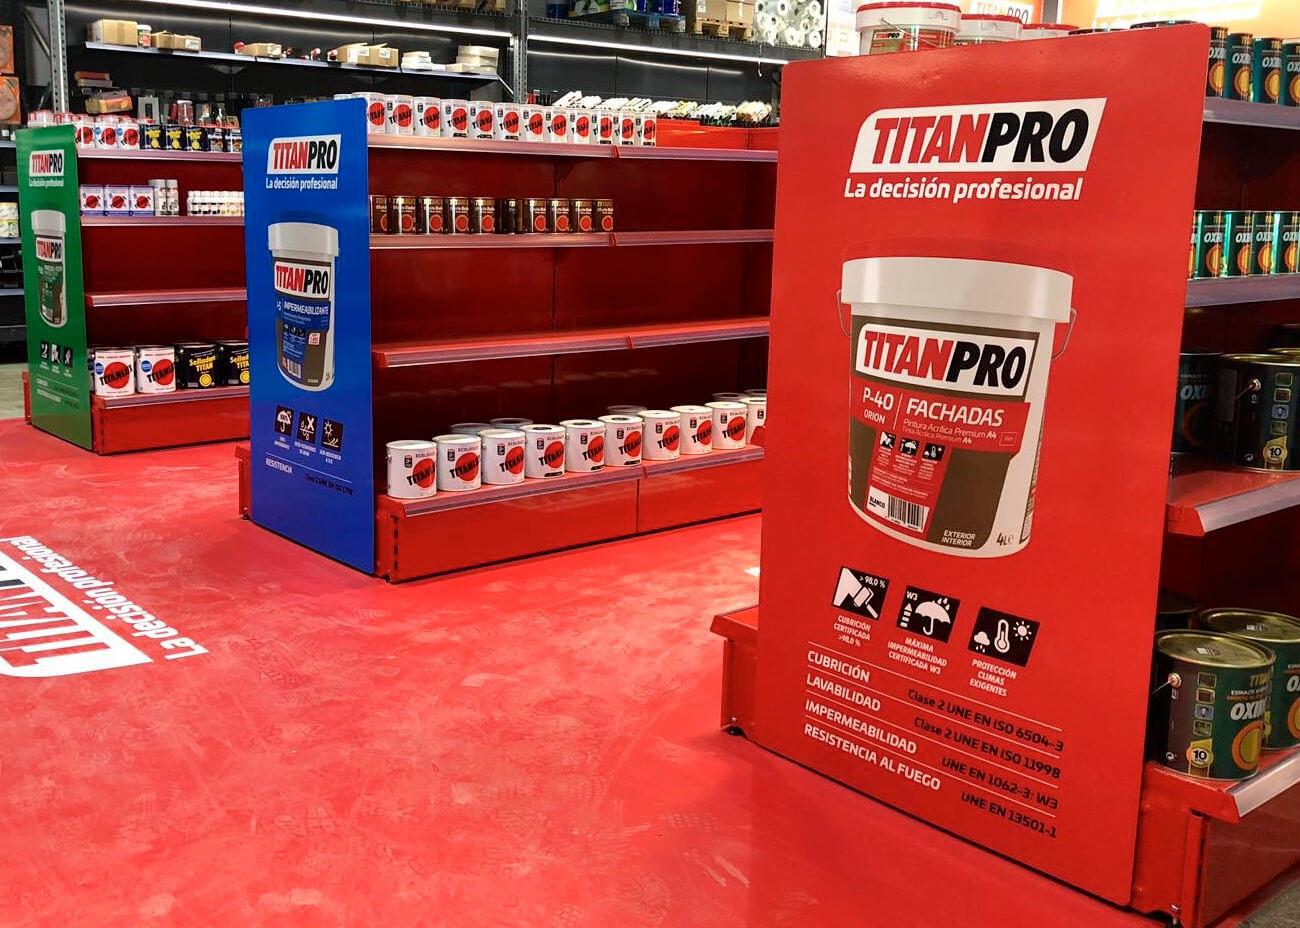 titanpro-img07-caad-retail-design-barcelona